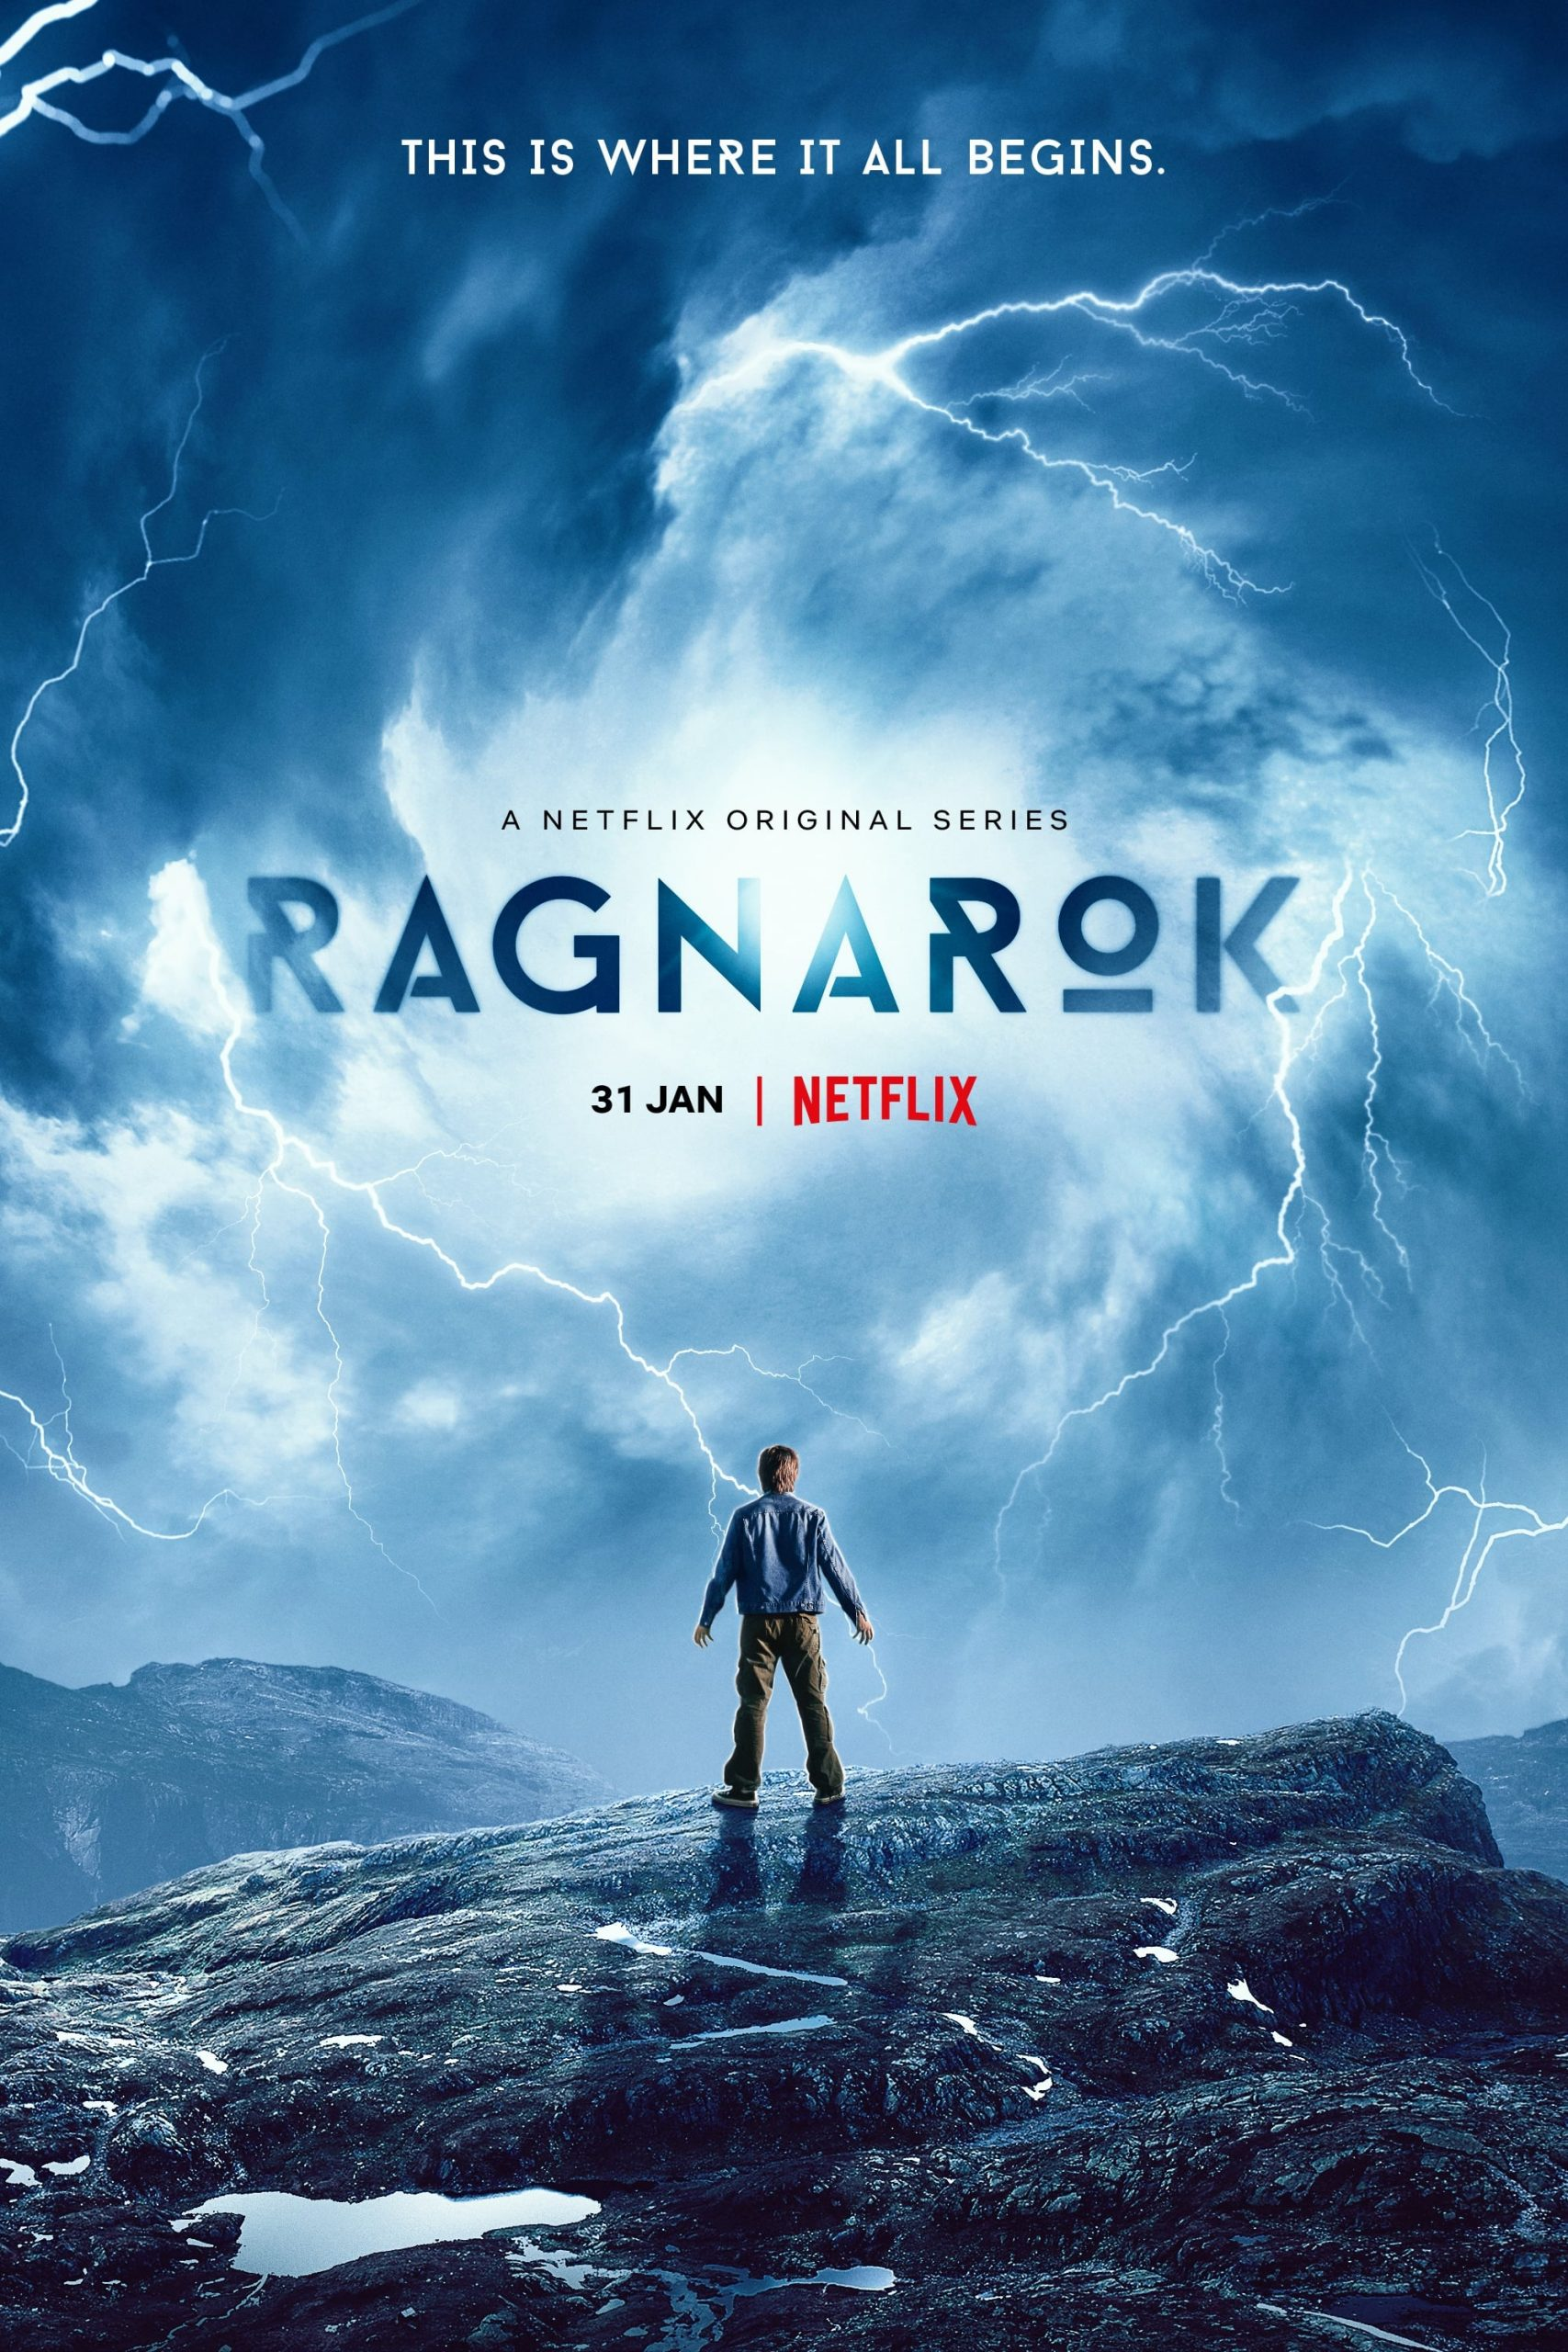 Ragnarok มหาศึกชี้ชะตา Season 1 ซับไทย ตอนที่ 1-6